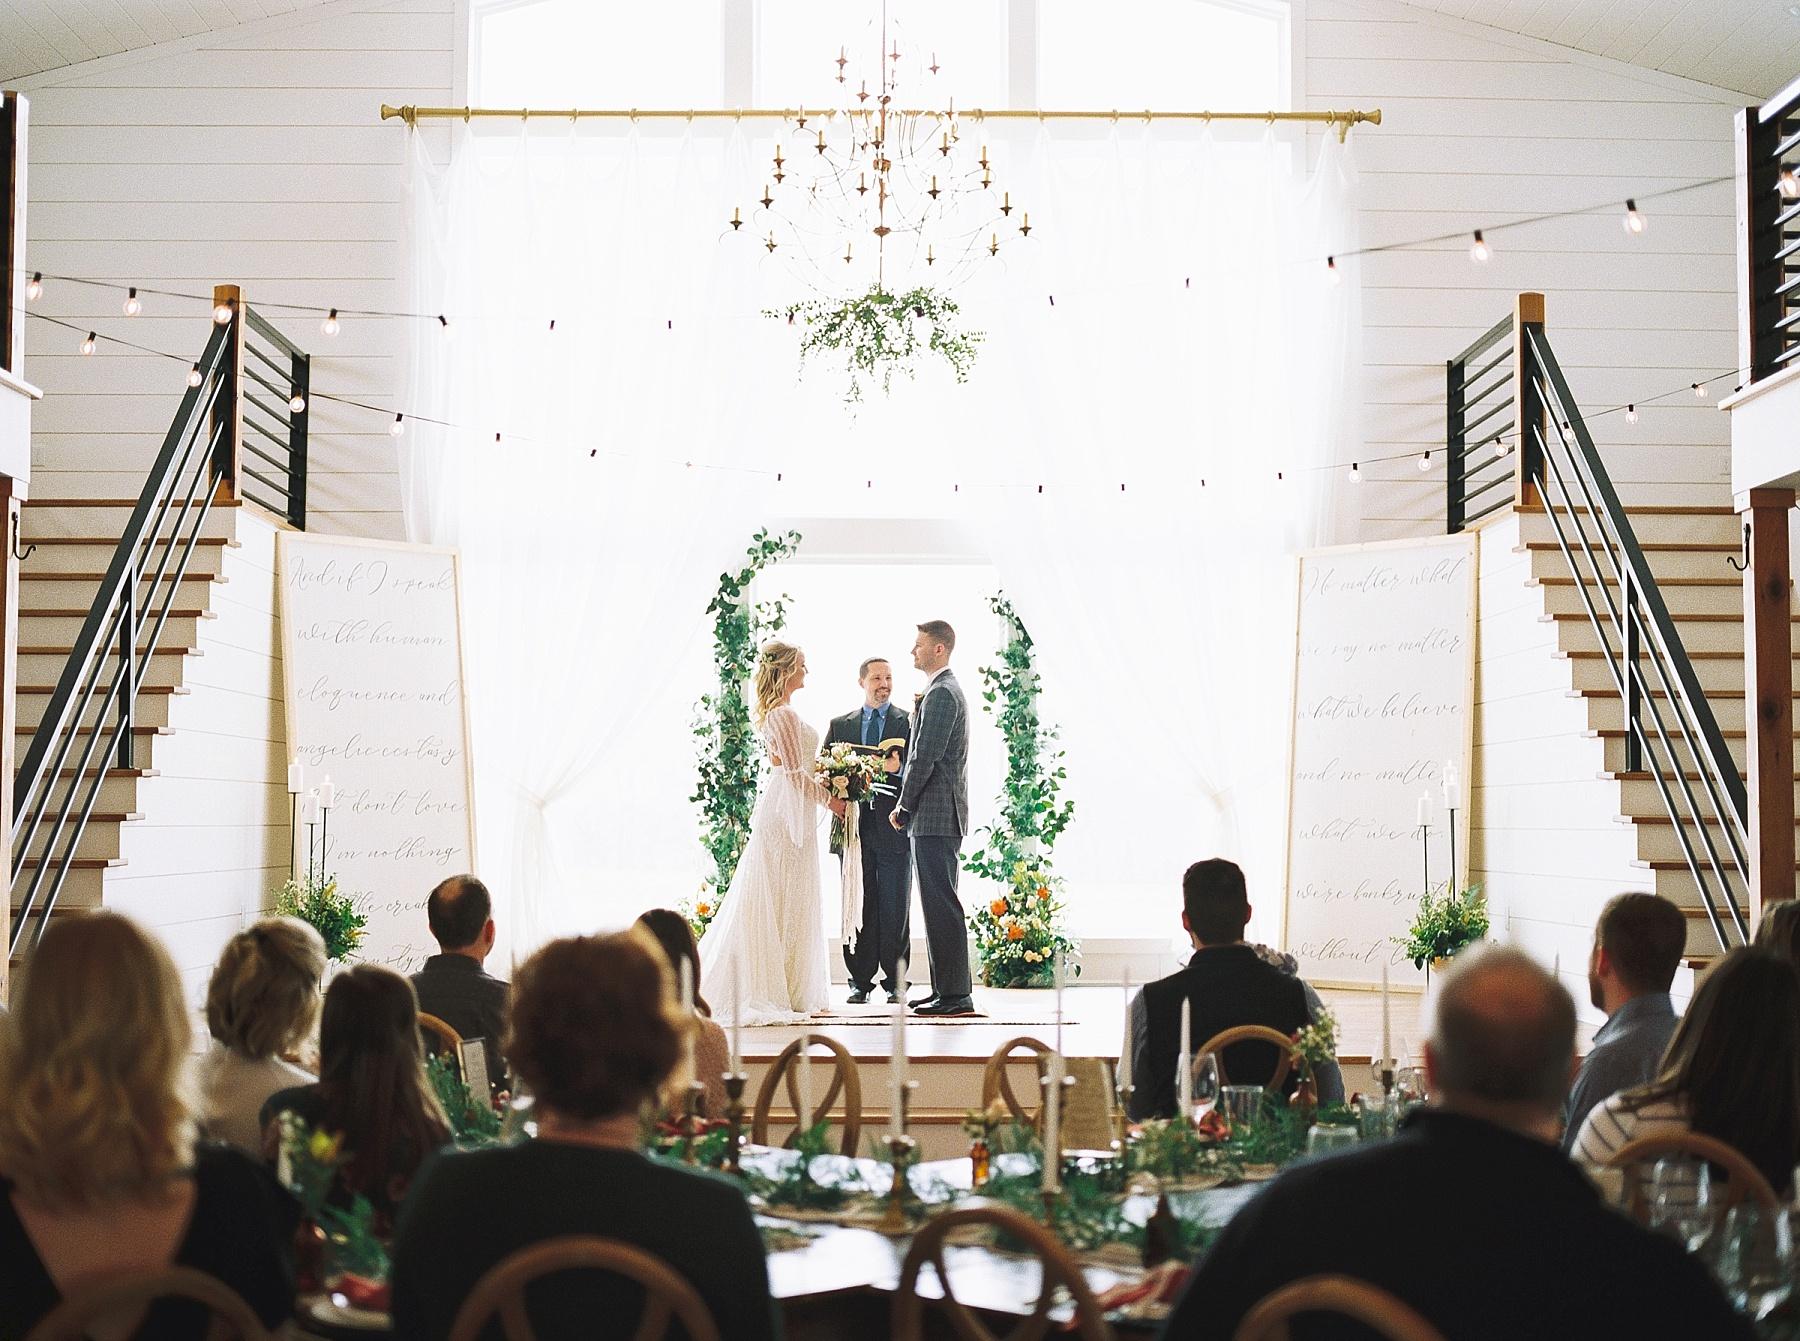 Eclectic Scandinavian Winter Wedding in All White Venue Emerson Fields by Kelsi Kliethermes Photography Best Missouri and Maui Wedding Photographer_0006.jpg